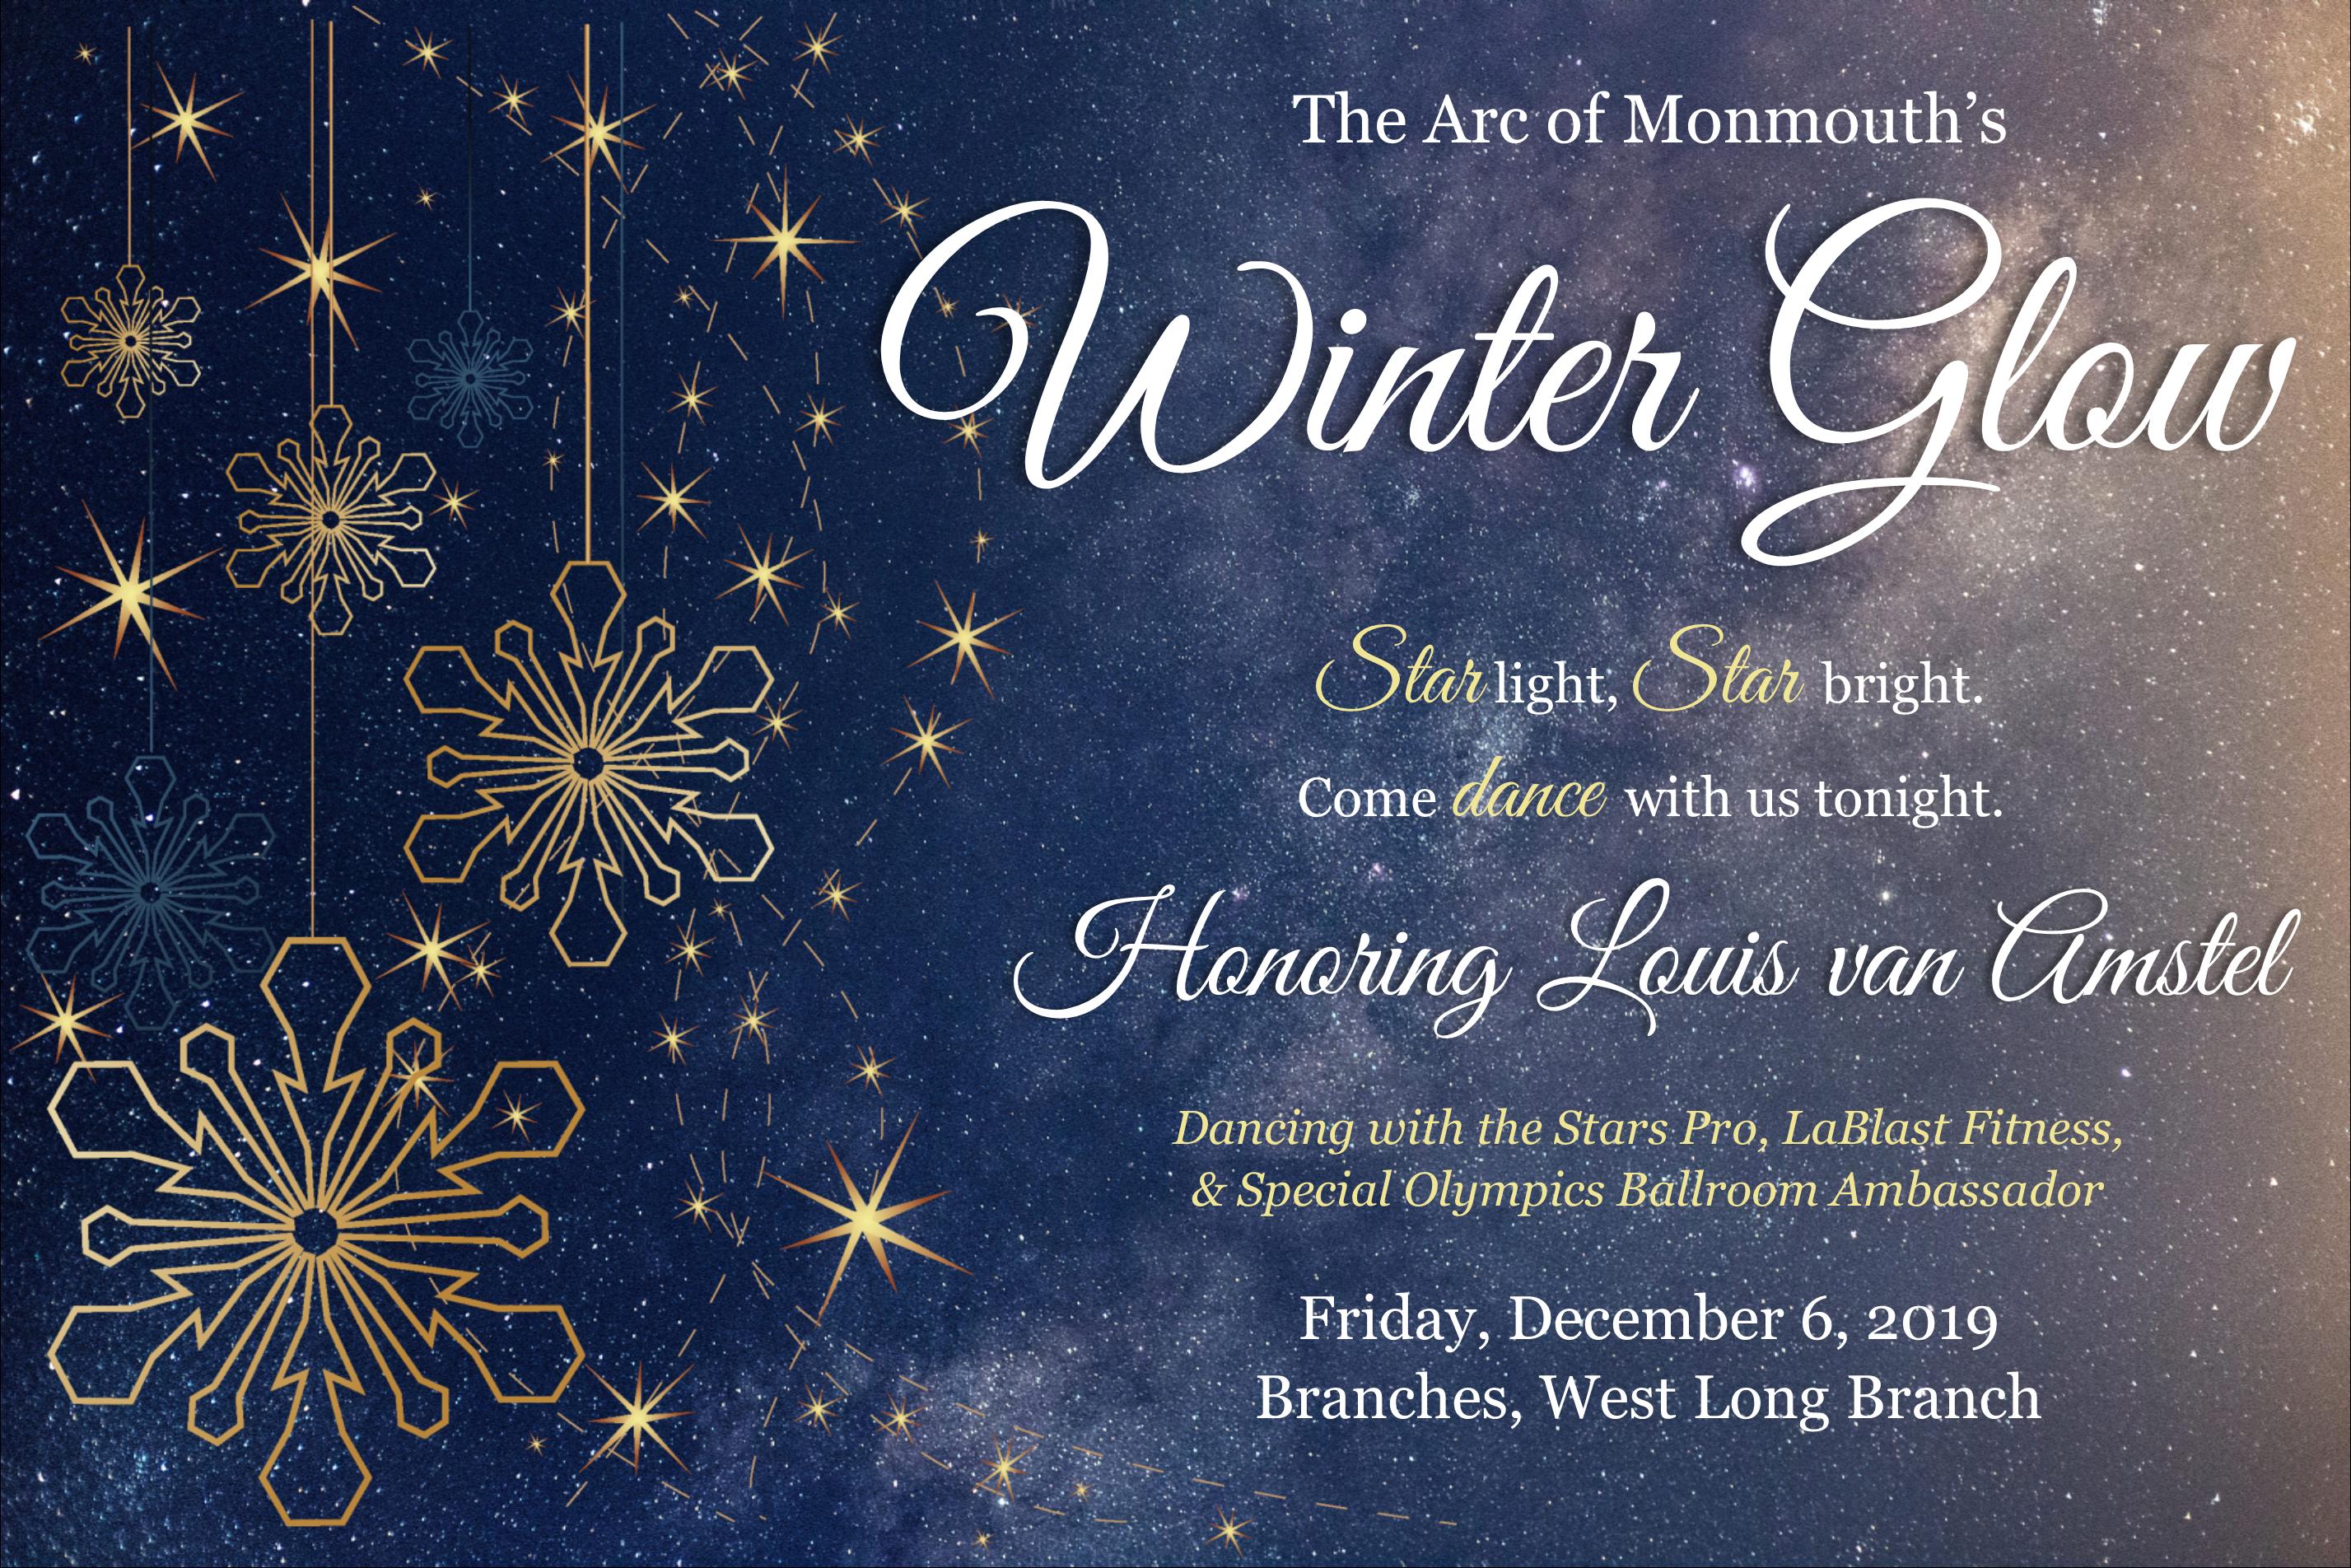 Winter Glow gala